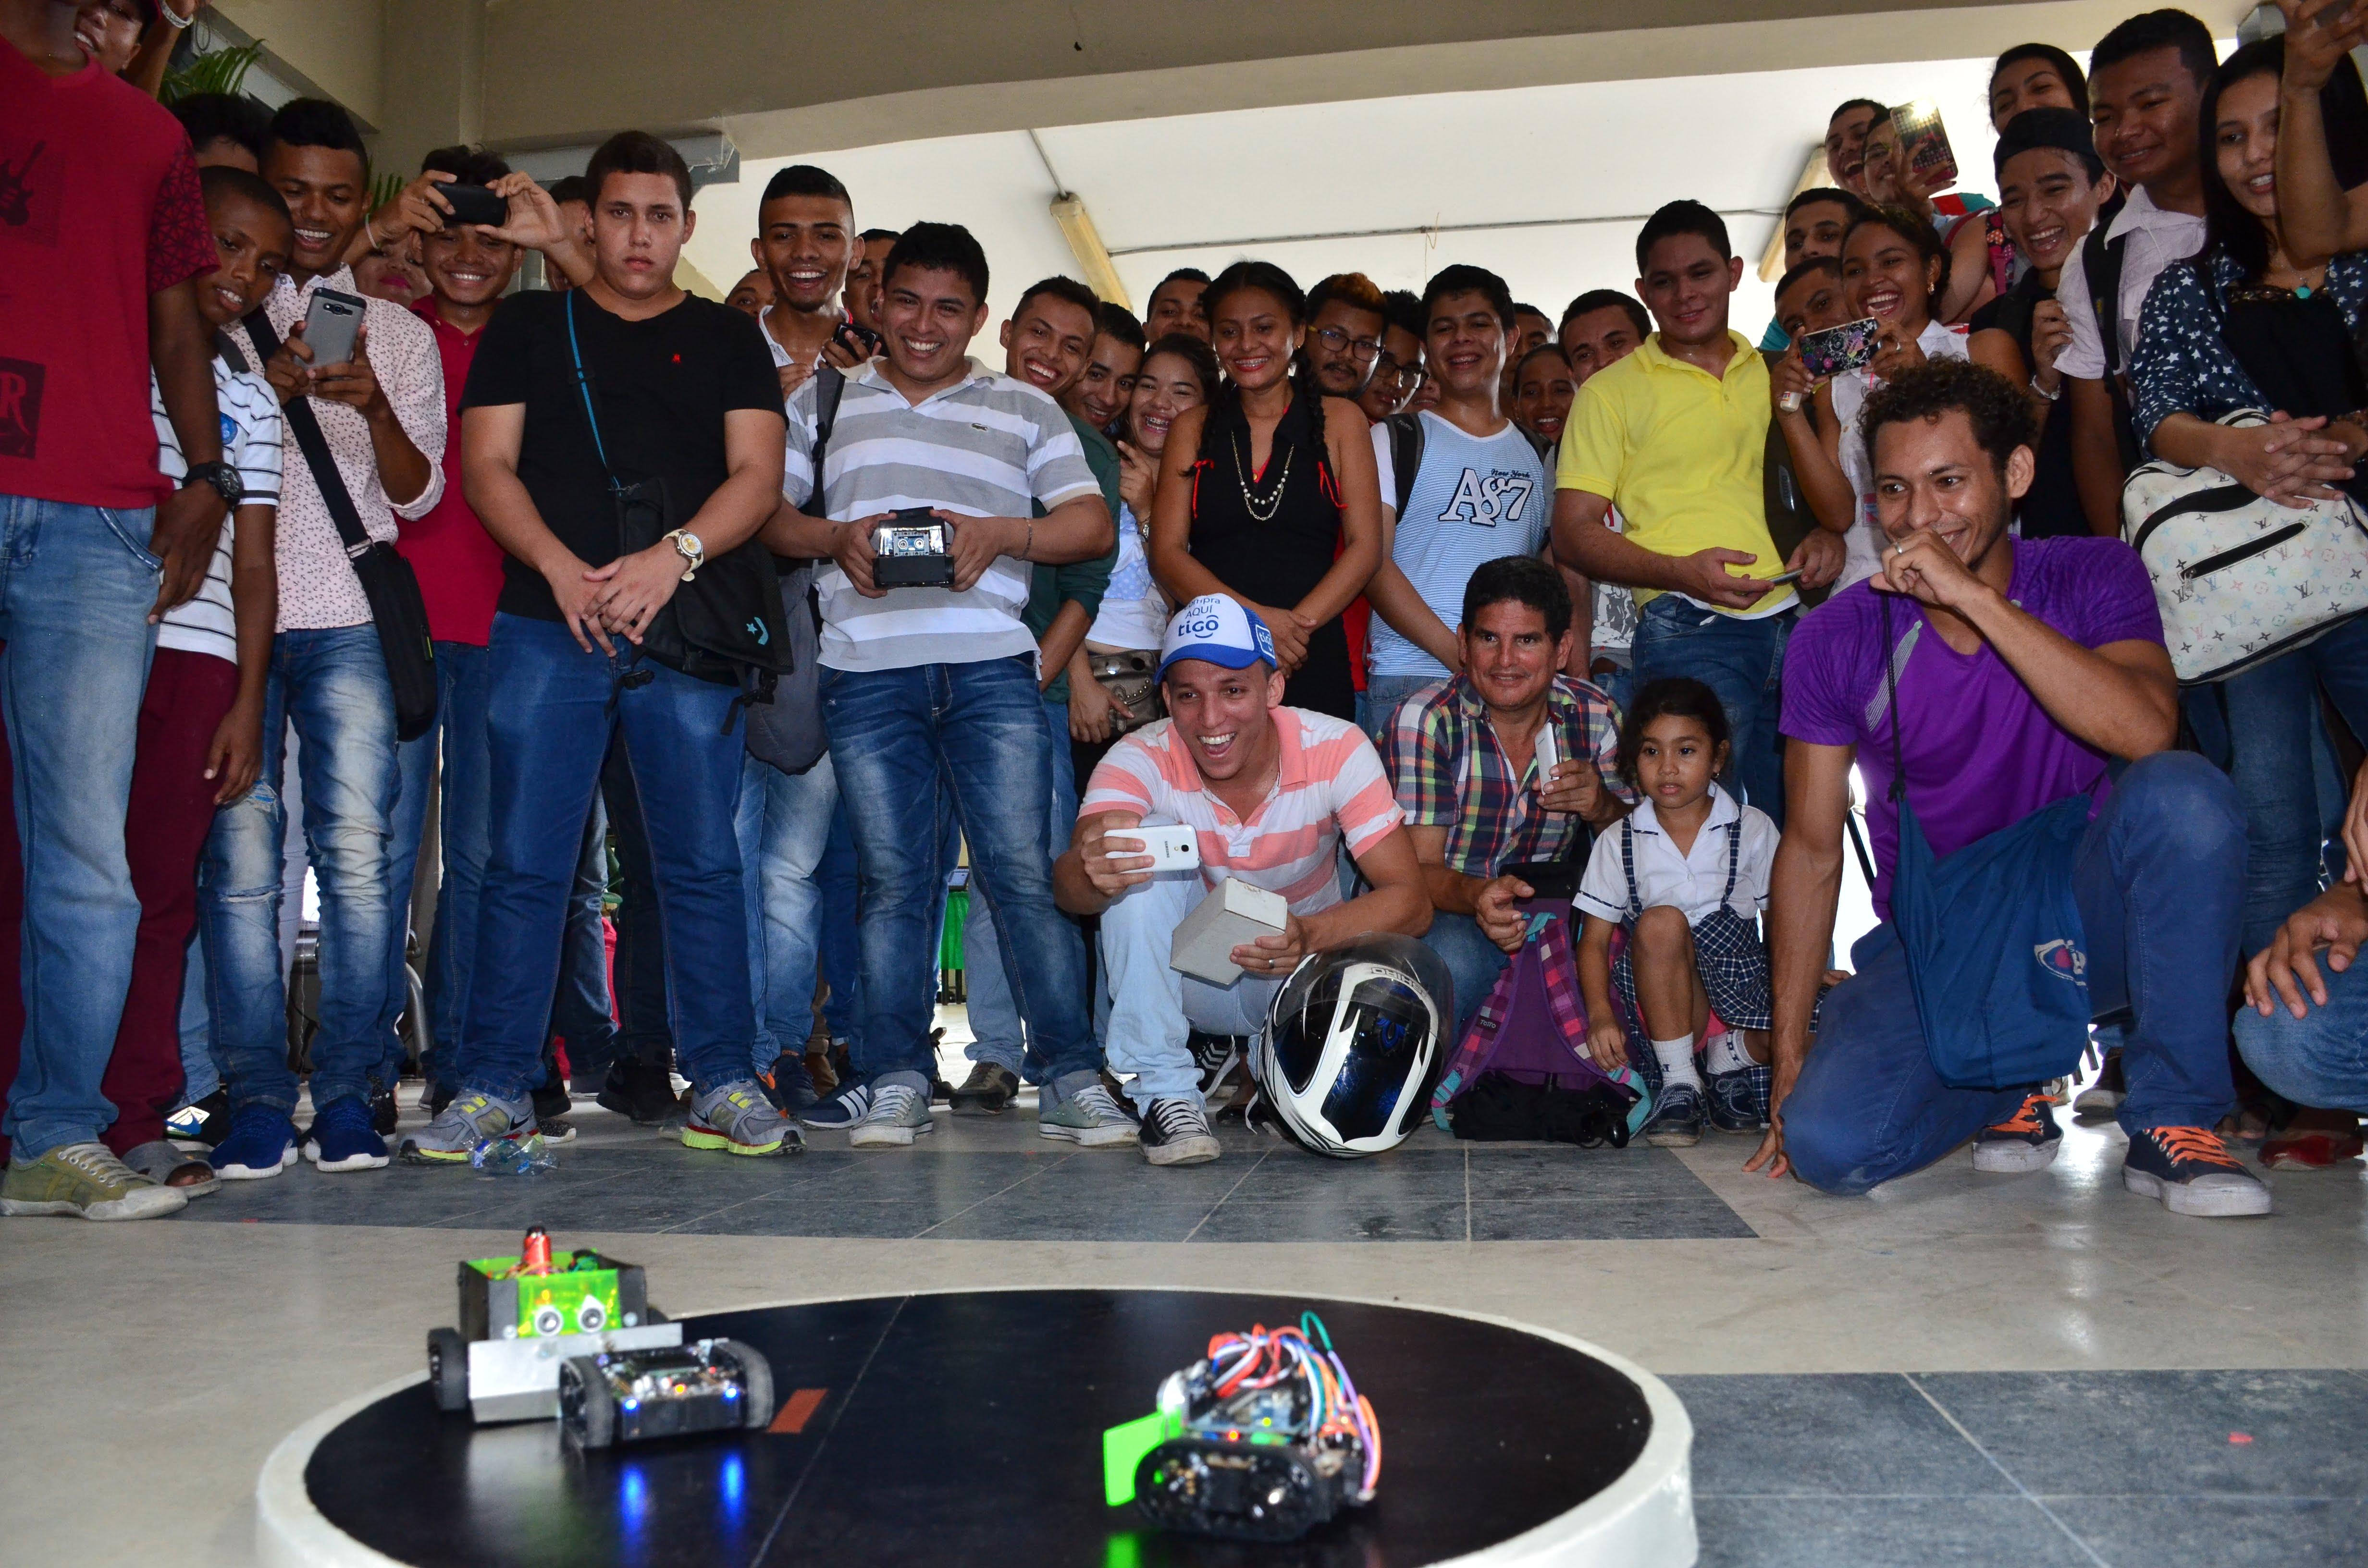 VII Torneo de Robótica en la Universidad de Córdoba